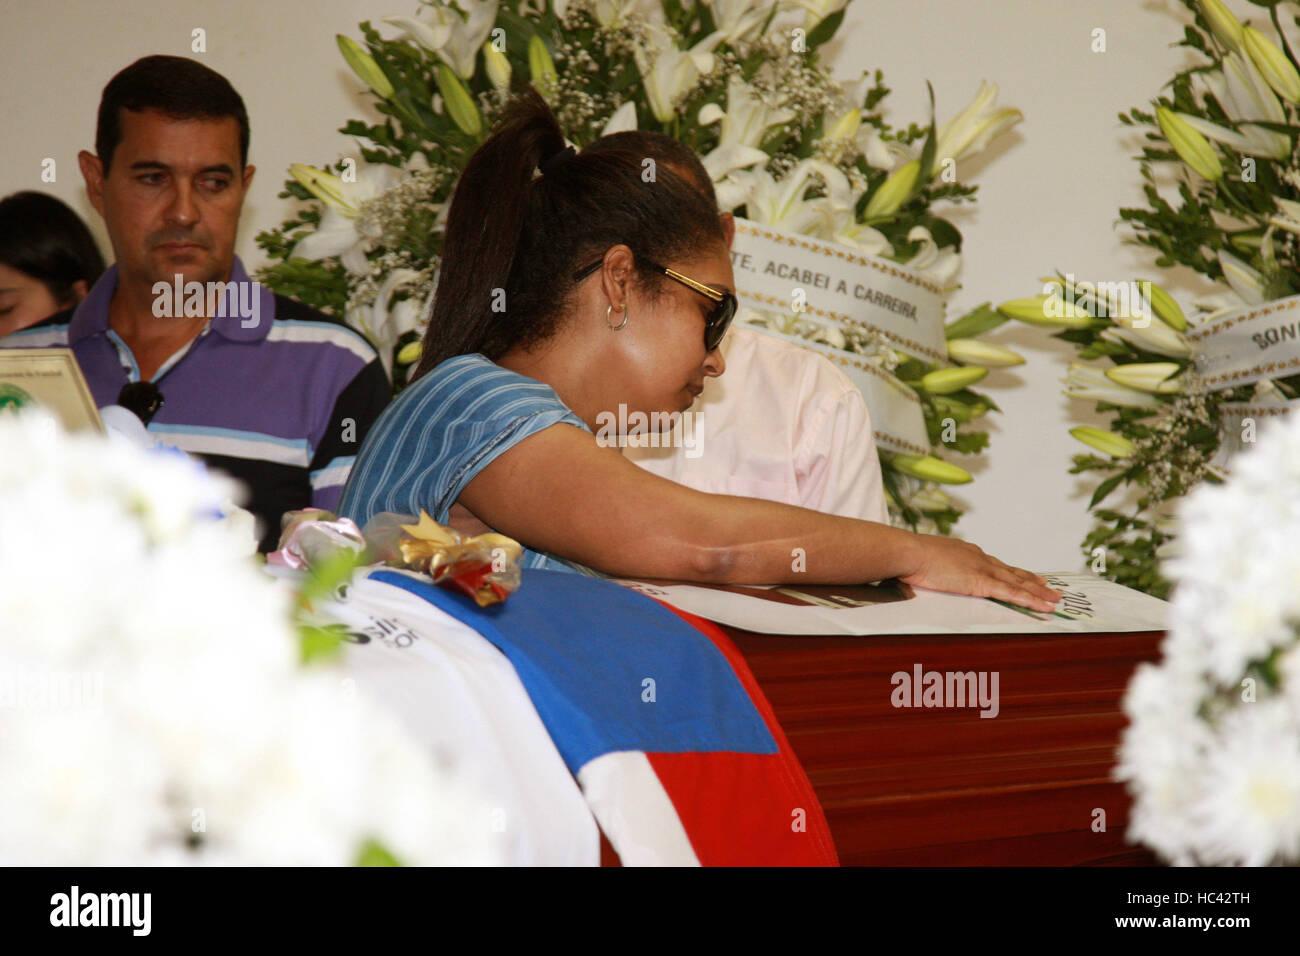 SALVADOR, BA - 04.12.2016: VELORIO DE ANANIAS JOGADOR CHAPECO - Eloi Castro Monteiro Ananias, player Chapecoense - Stock Image